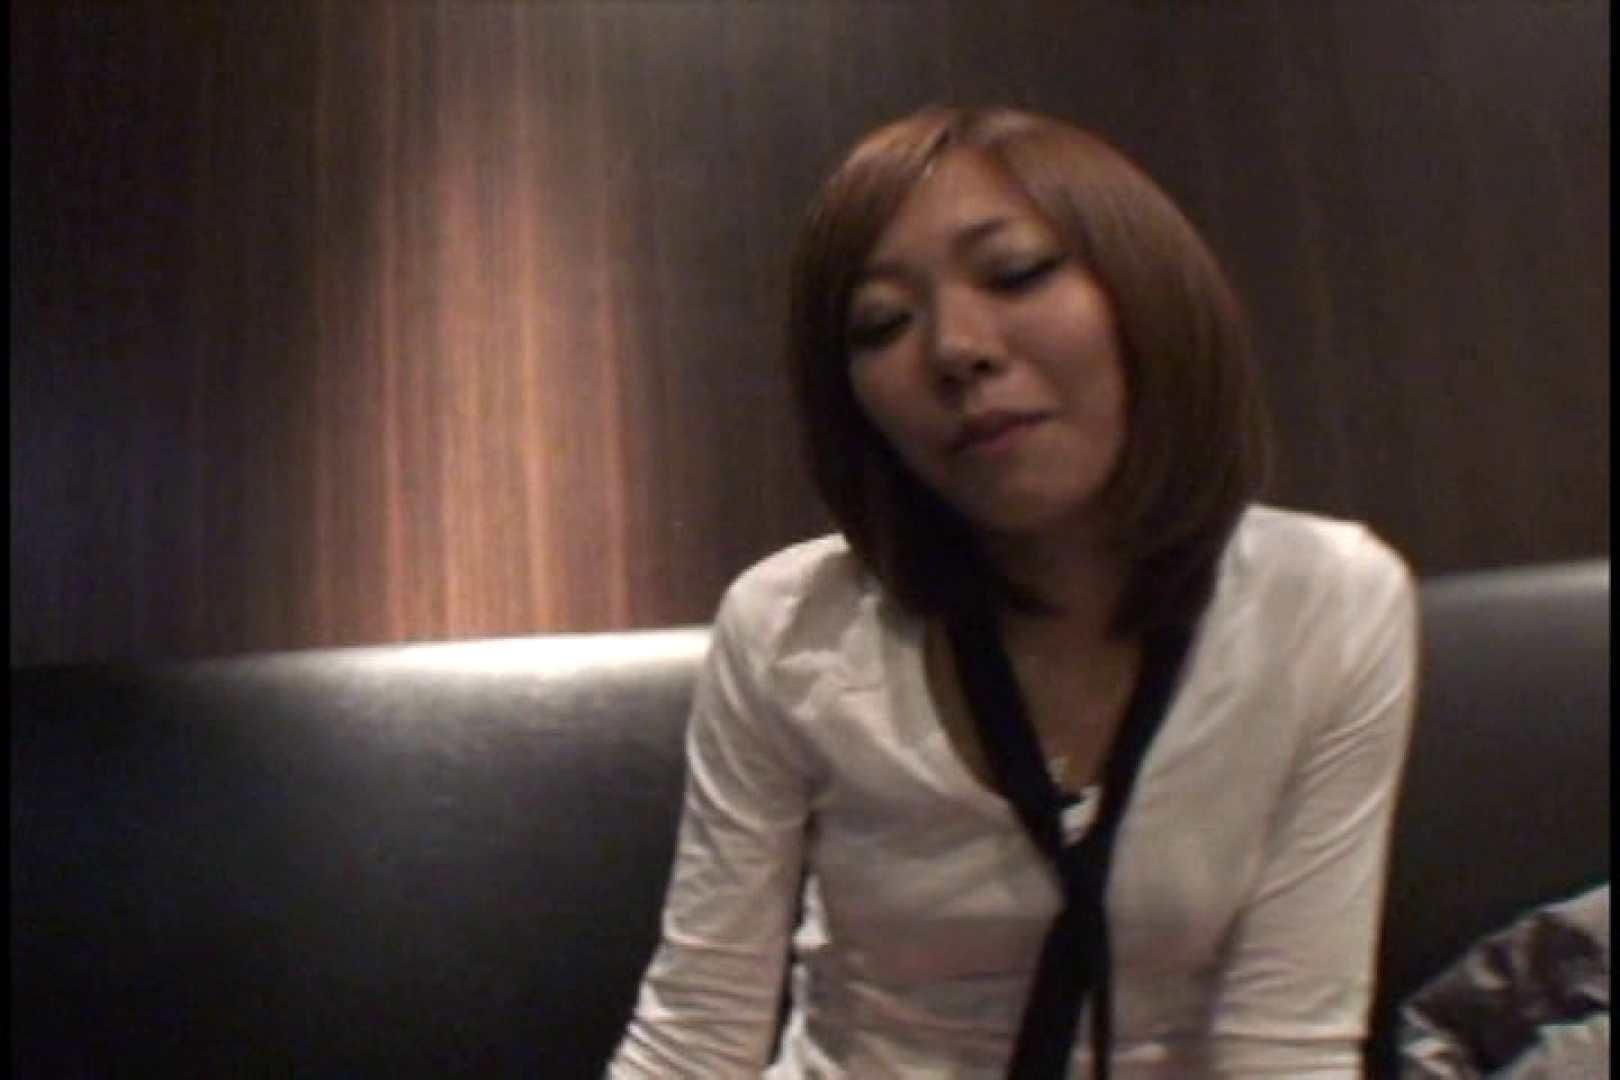 JDハンター全国ツアー vol.036 前編 女子大生のエロ動画 | 0  85PIX 35